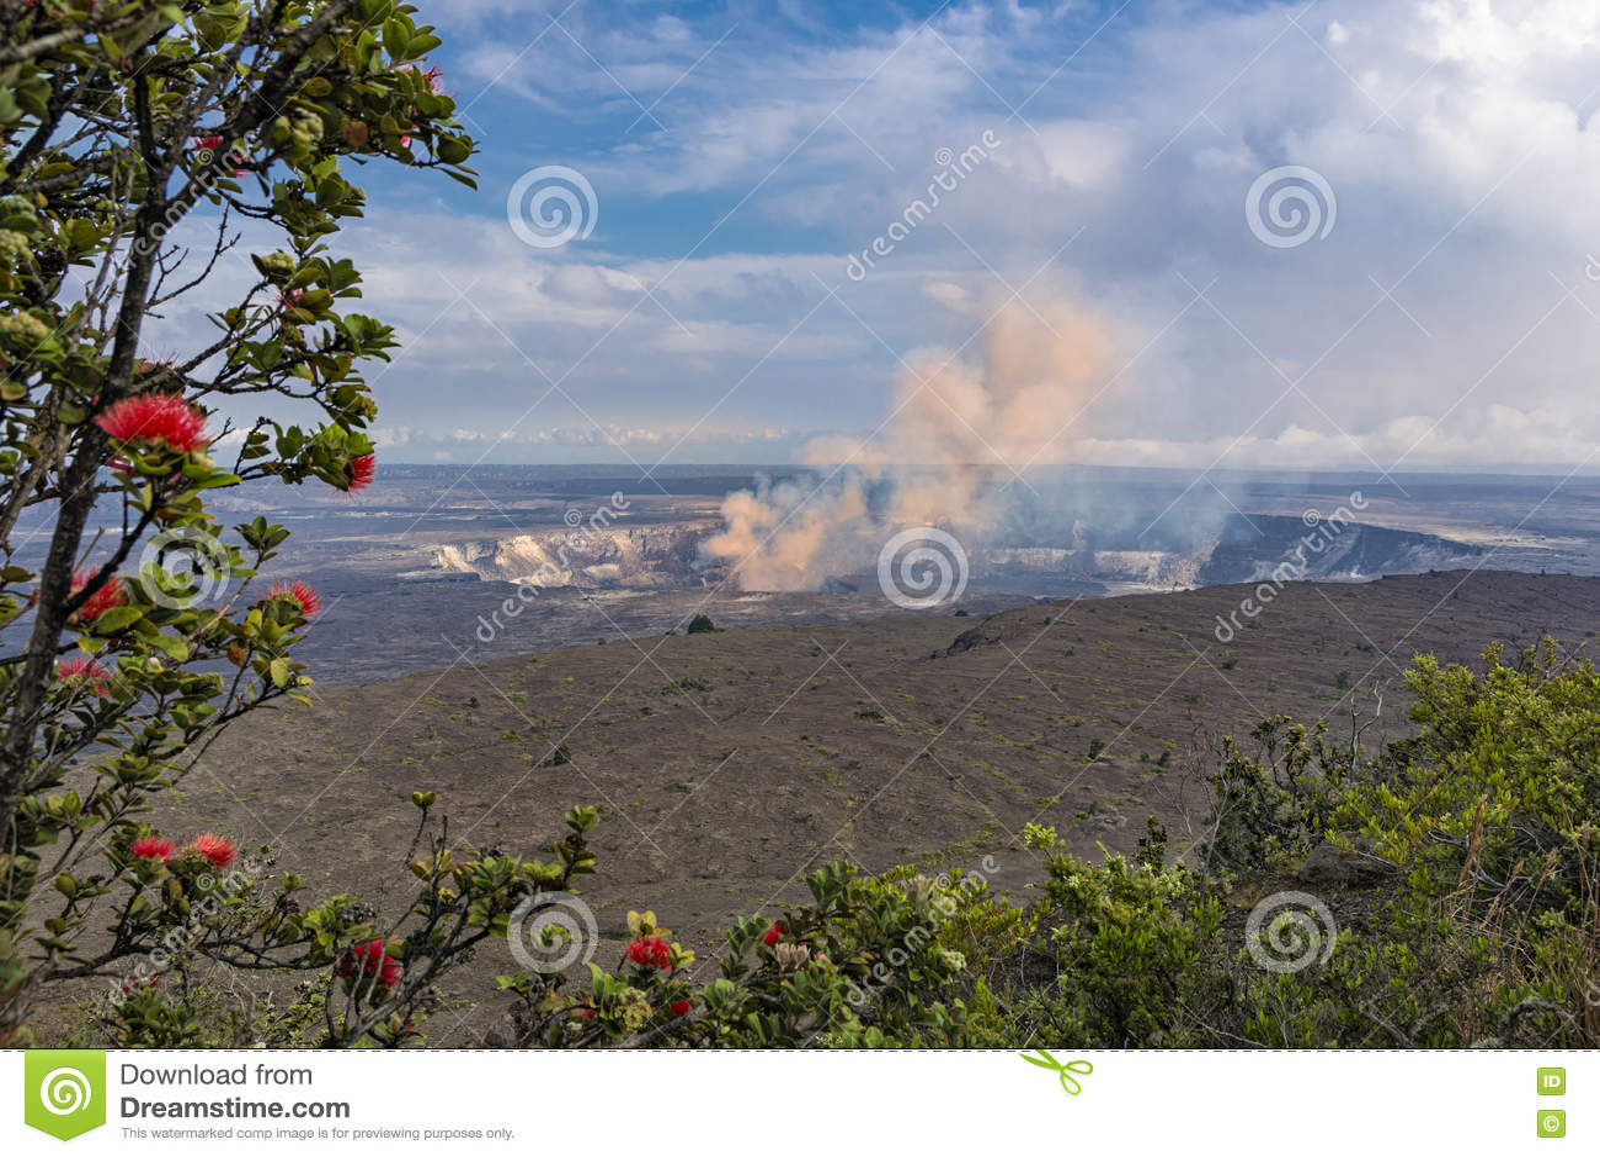 Volcan de caldeira de Kilauea sur la grande île Hawaï